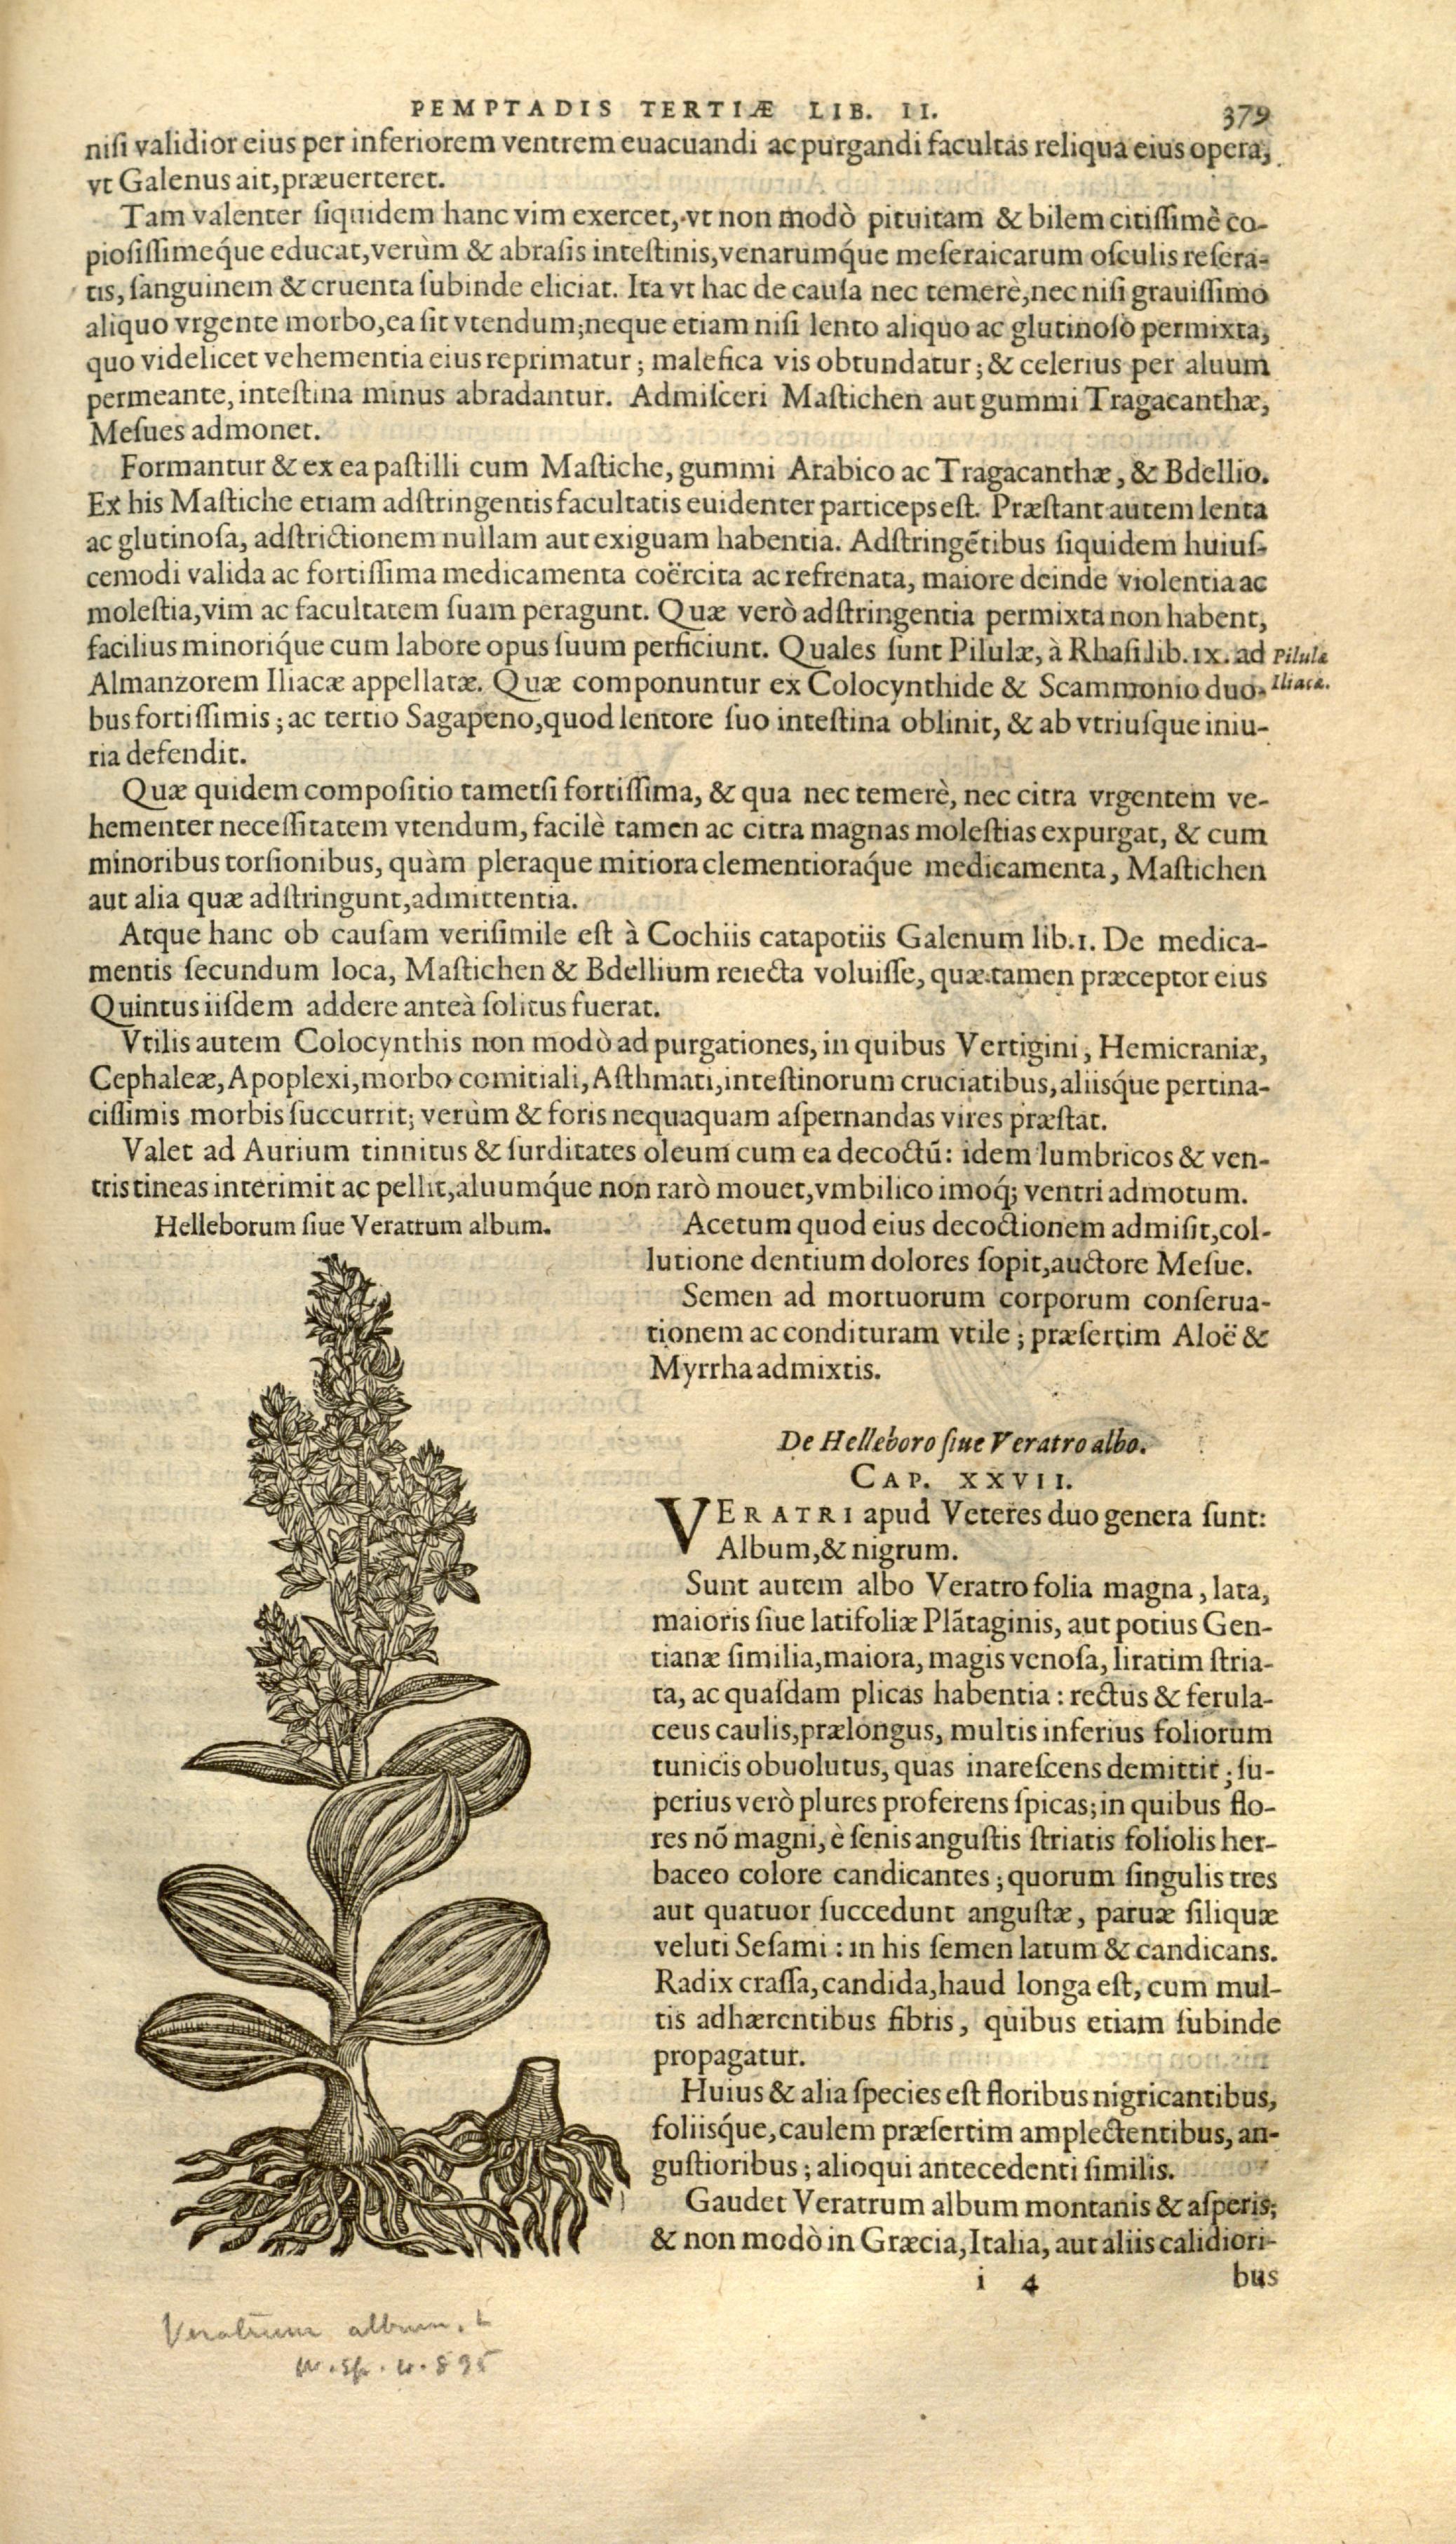 historiae pemptades sex, sive libri XXX (Page 379) BHL8100039.jpg Remberti Dodonaei ... Stirpium historiae pemptades sex, sive libri XXX. Date 1583 Source